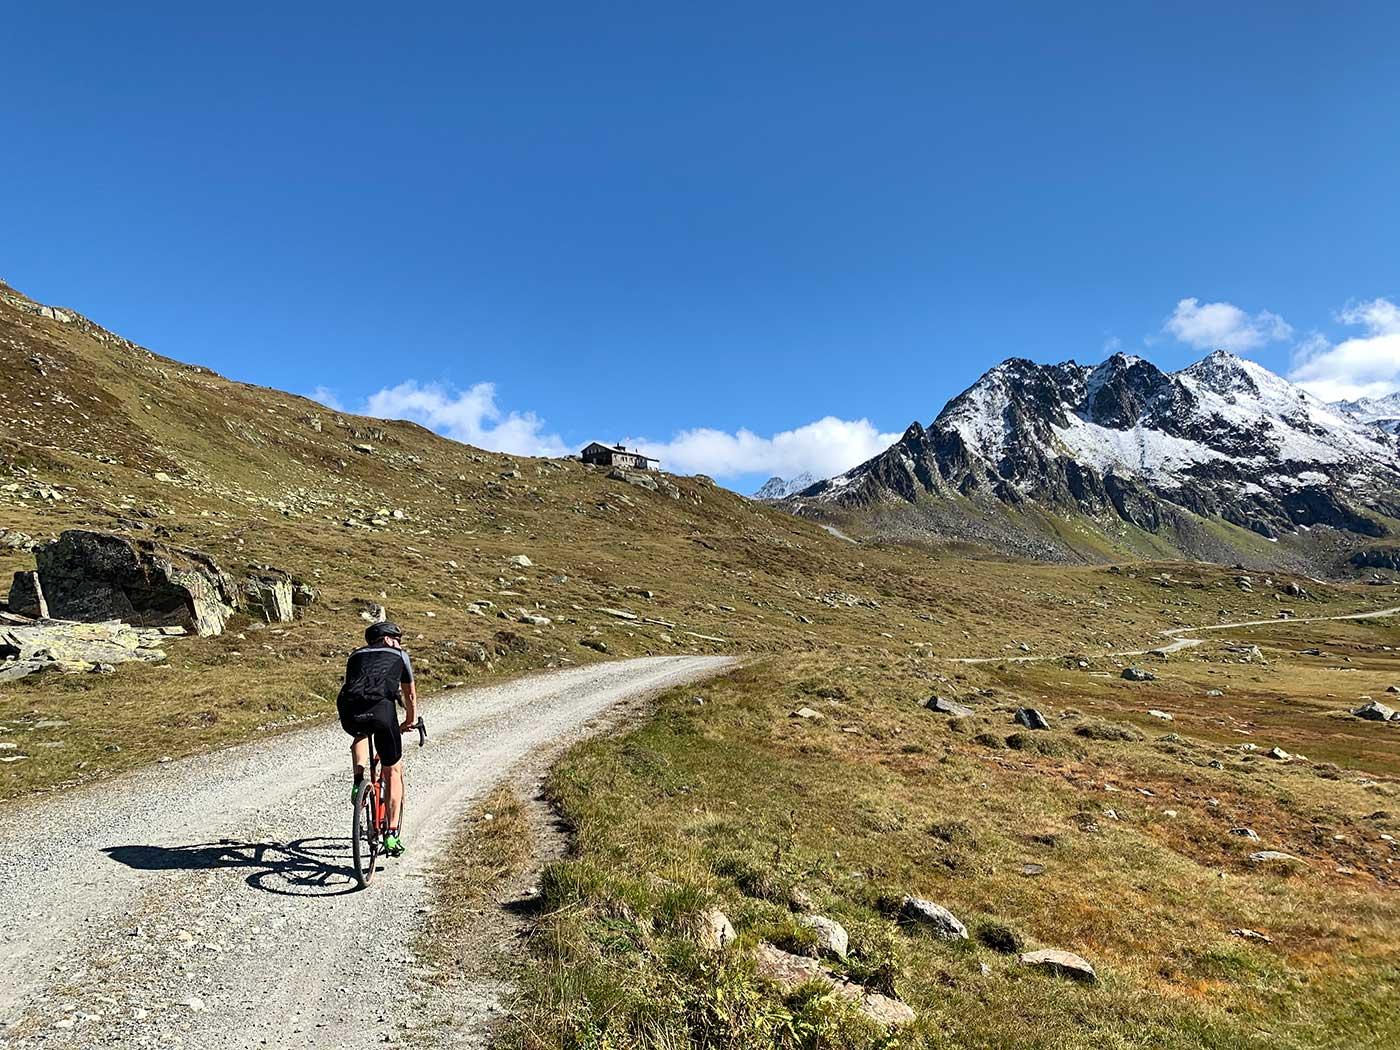 mountain hut refugio in switzerlands swiss alps